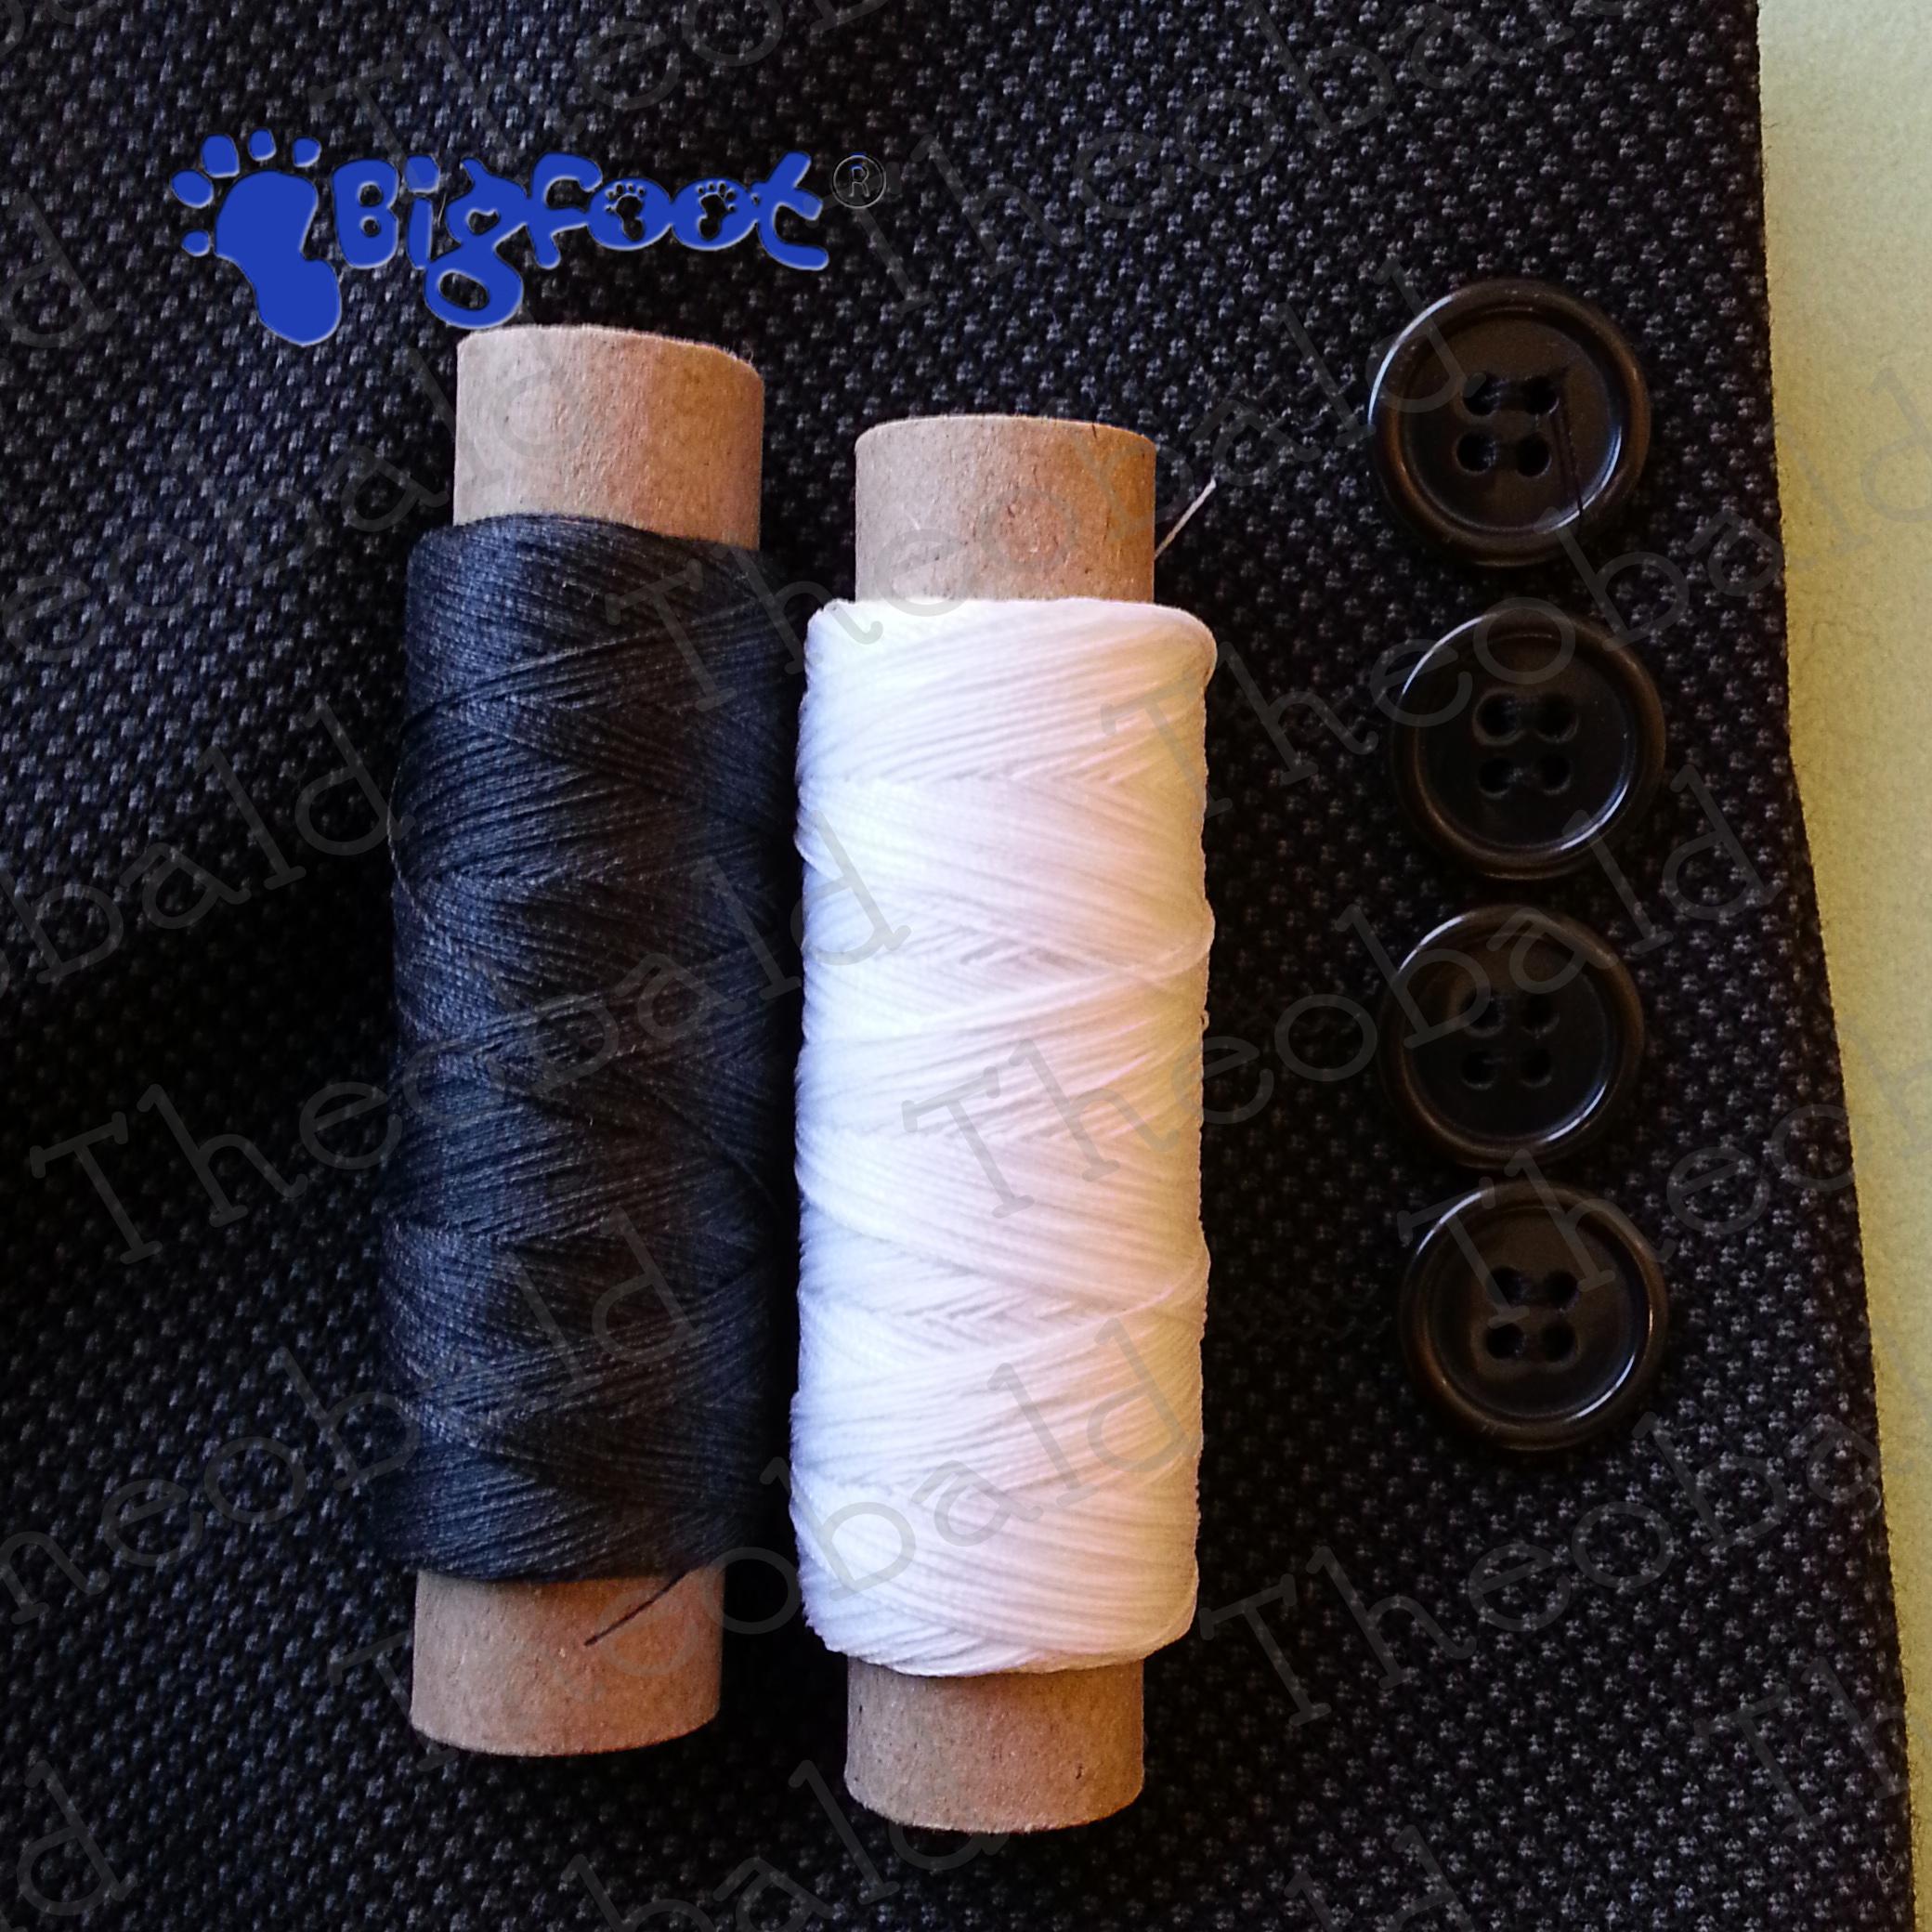 TRIXES 24 Cotton Sewing Thread Assorted Colours Fine Premium Quality Cotton Reels